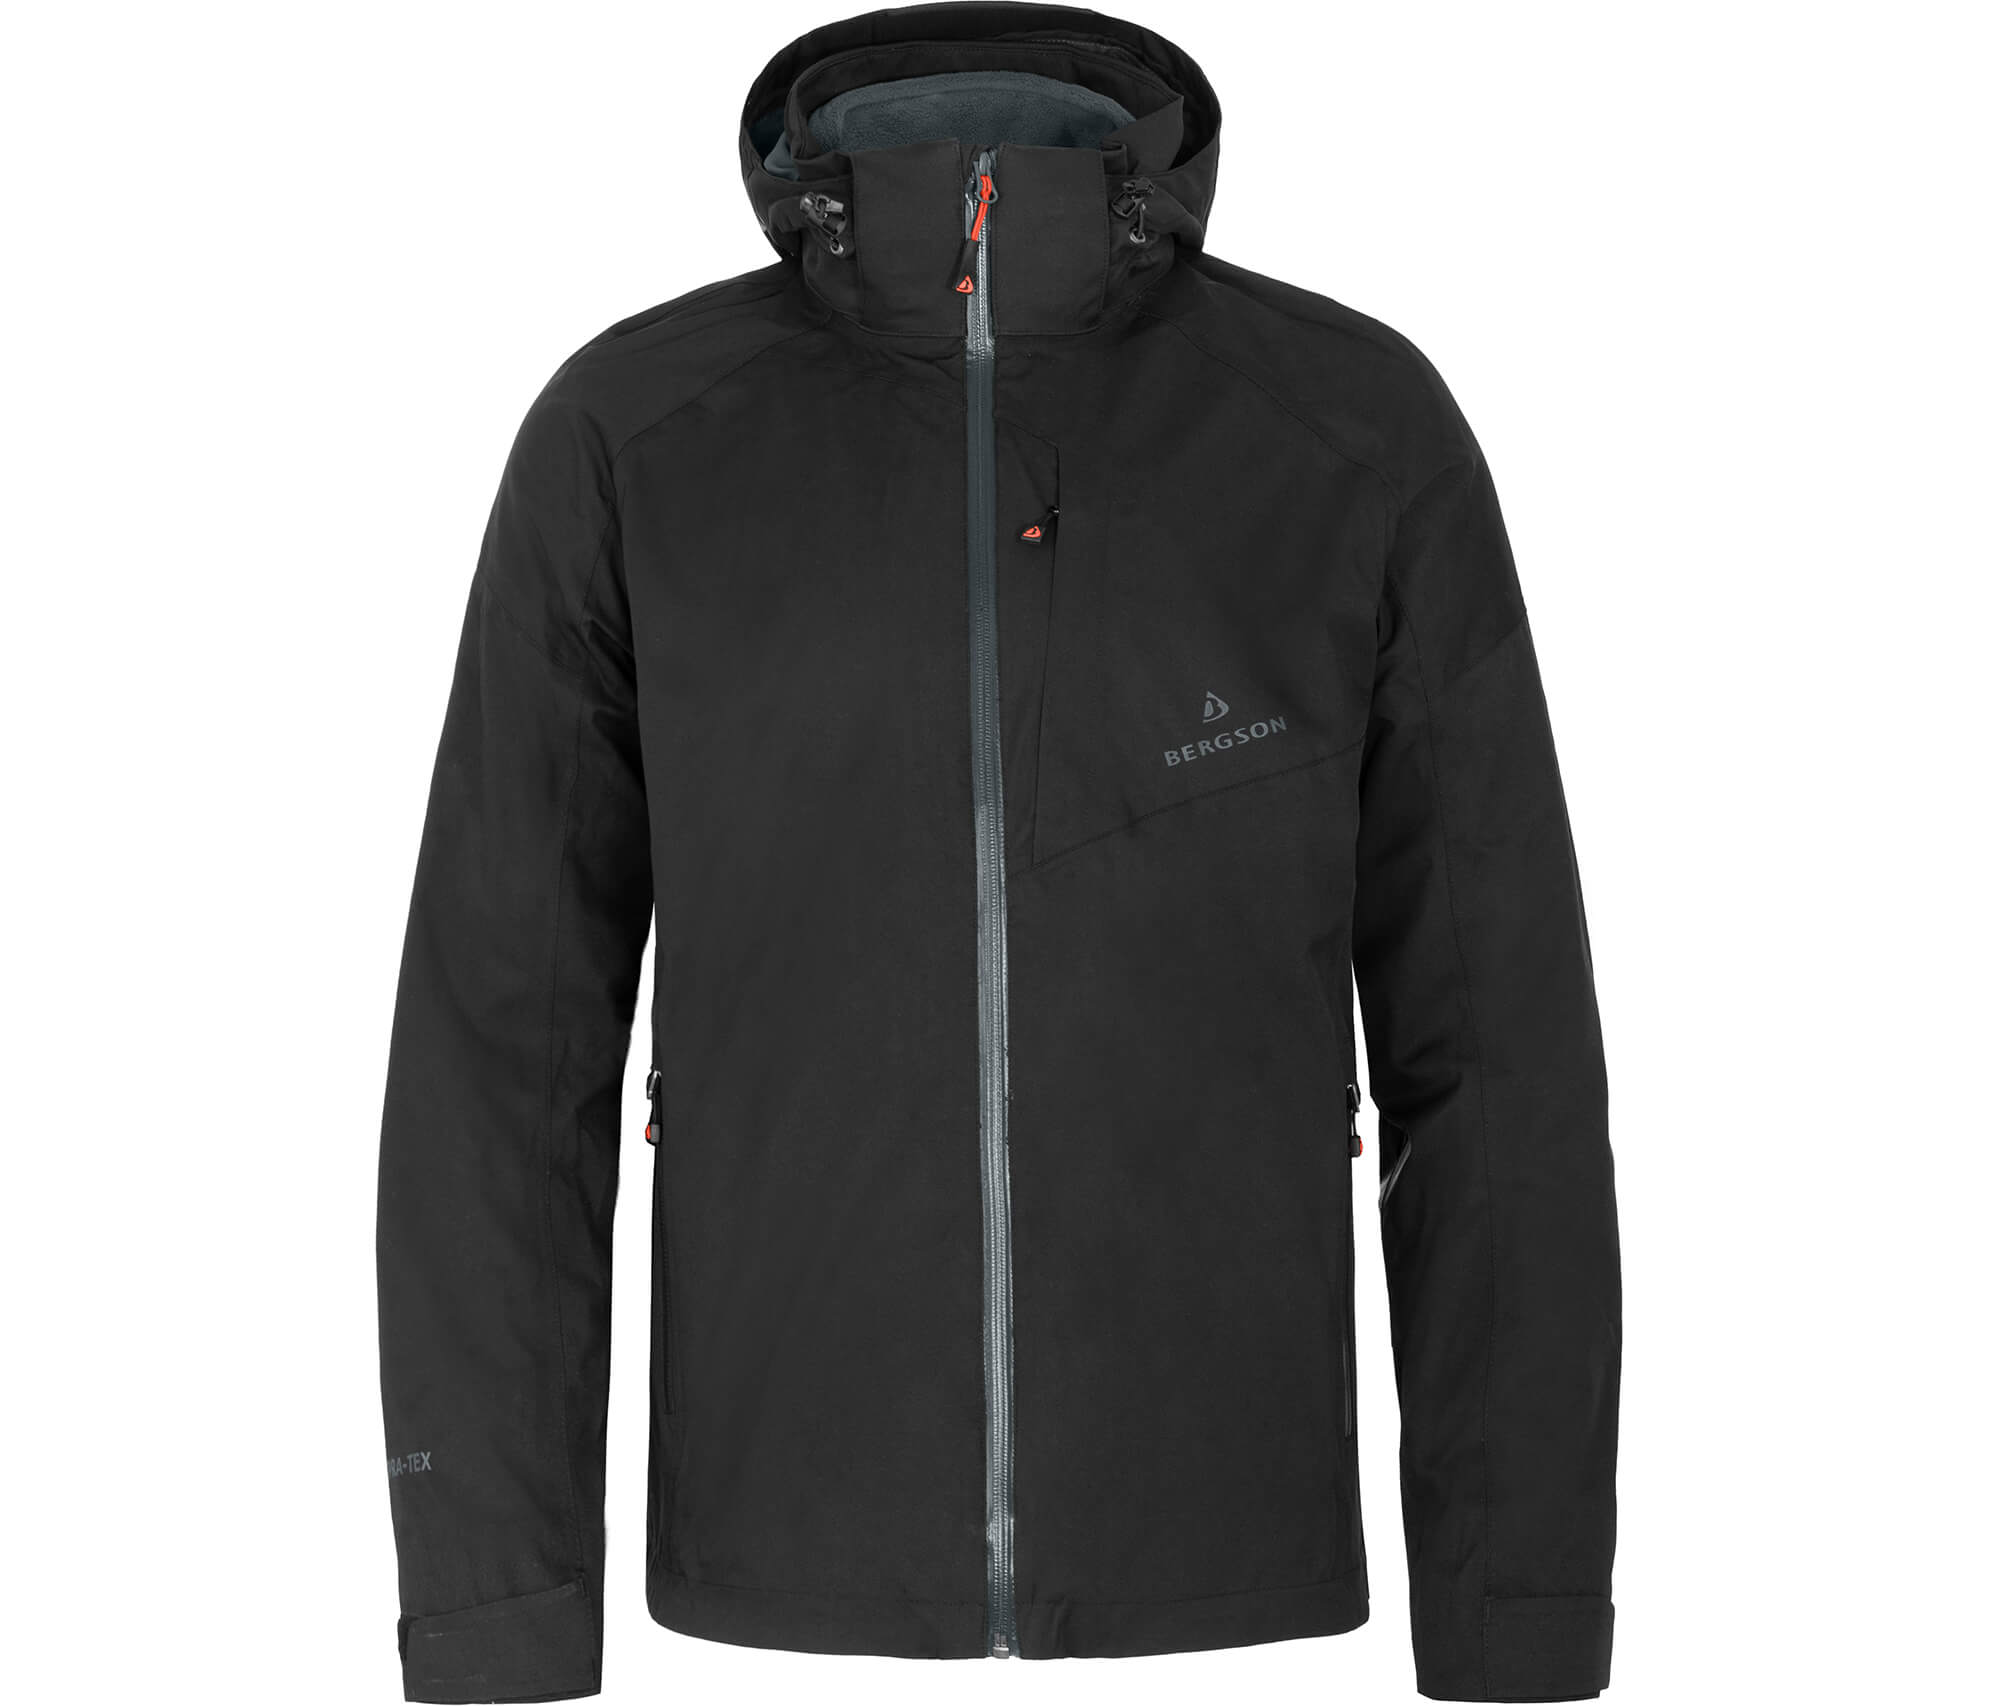 3 in 1 Jacke & Doppeljacken für Herren online kaufen | McTREK